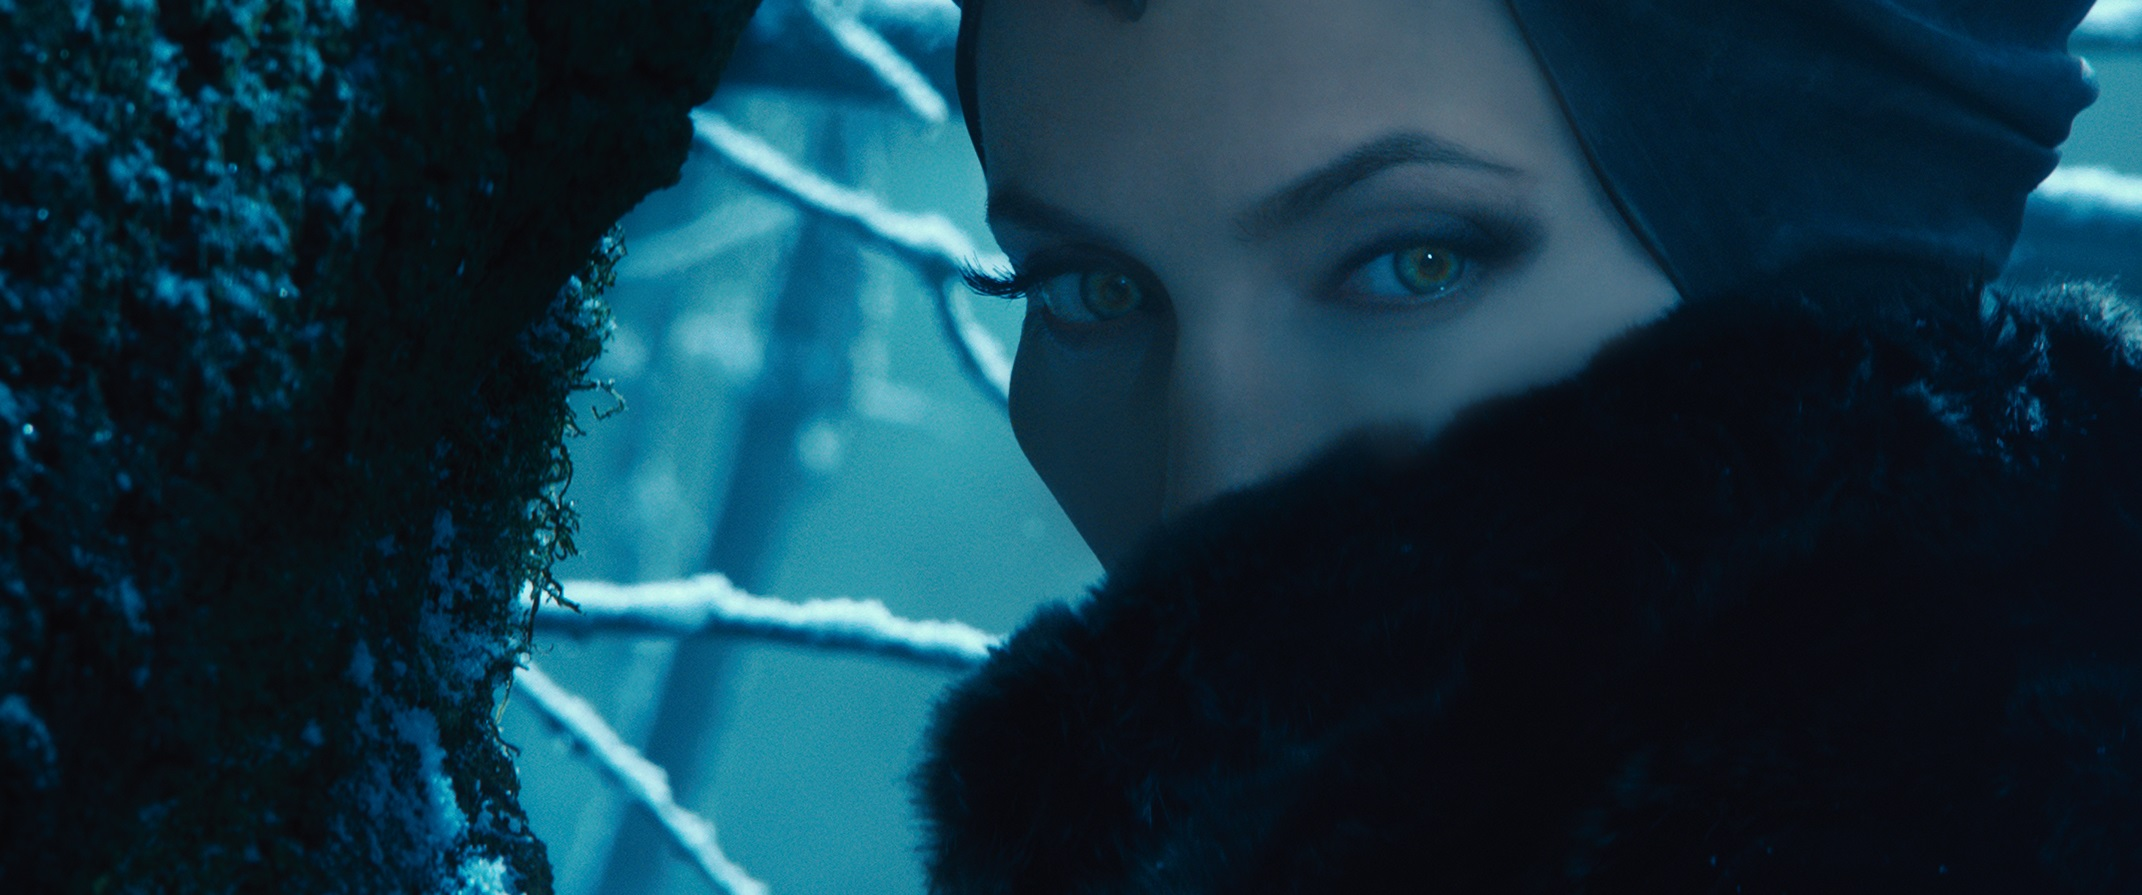 Maleficent - gaze